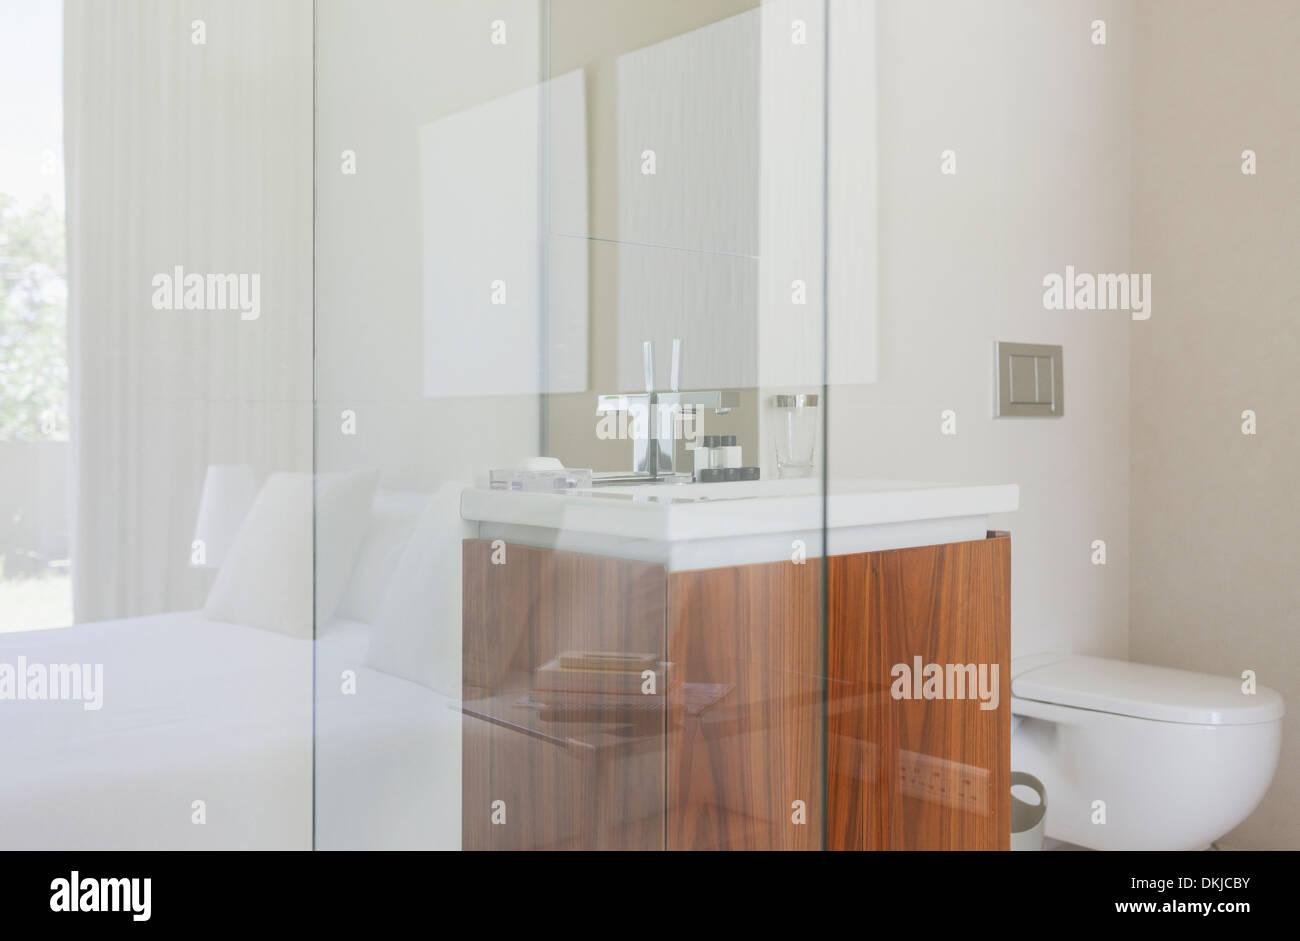 Glass walls of modern bathroom - Stock Image